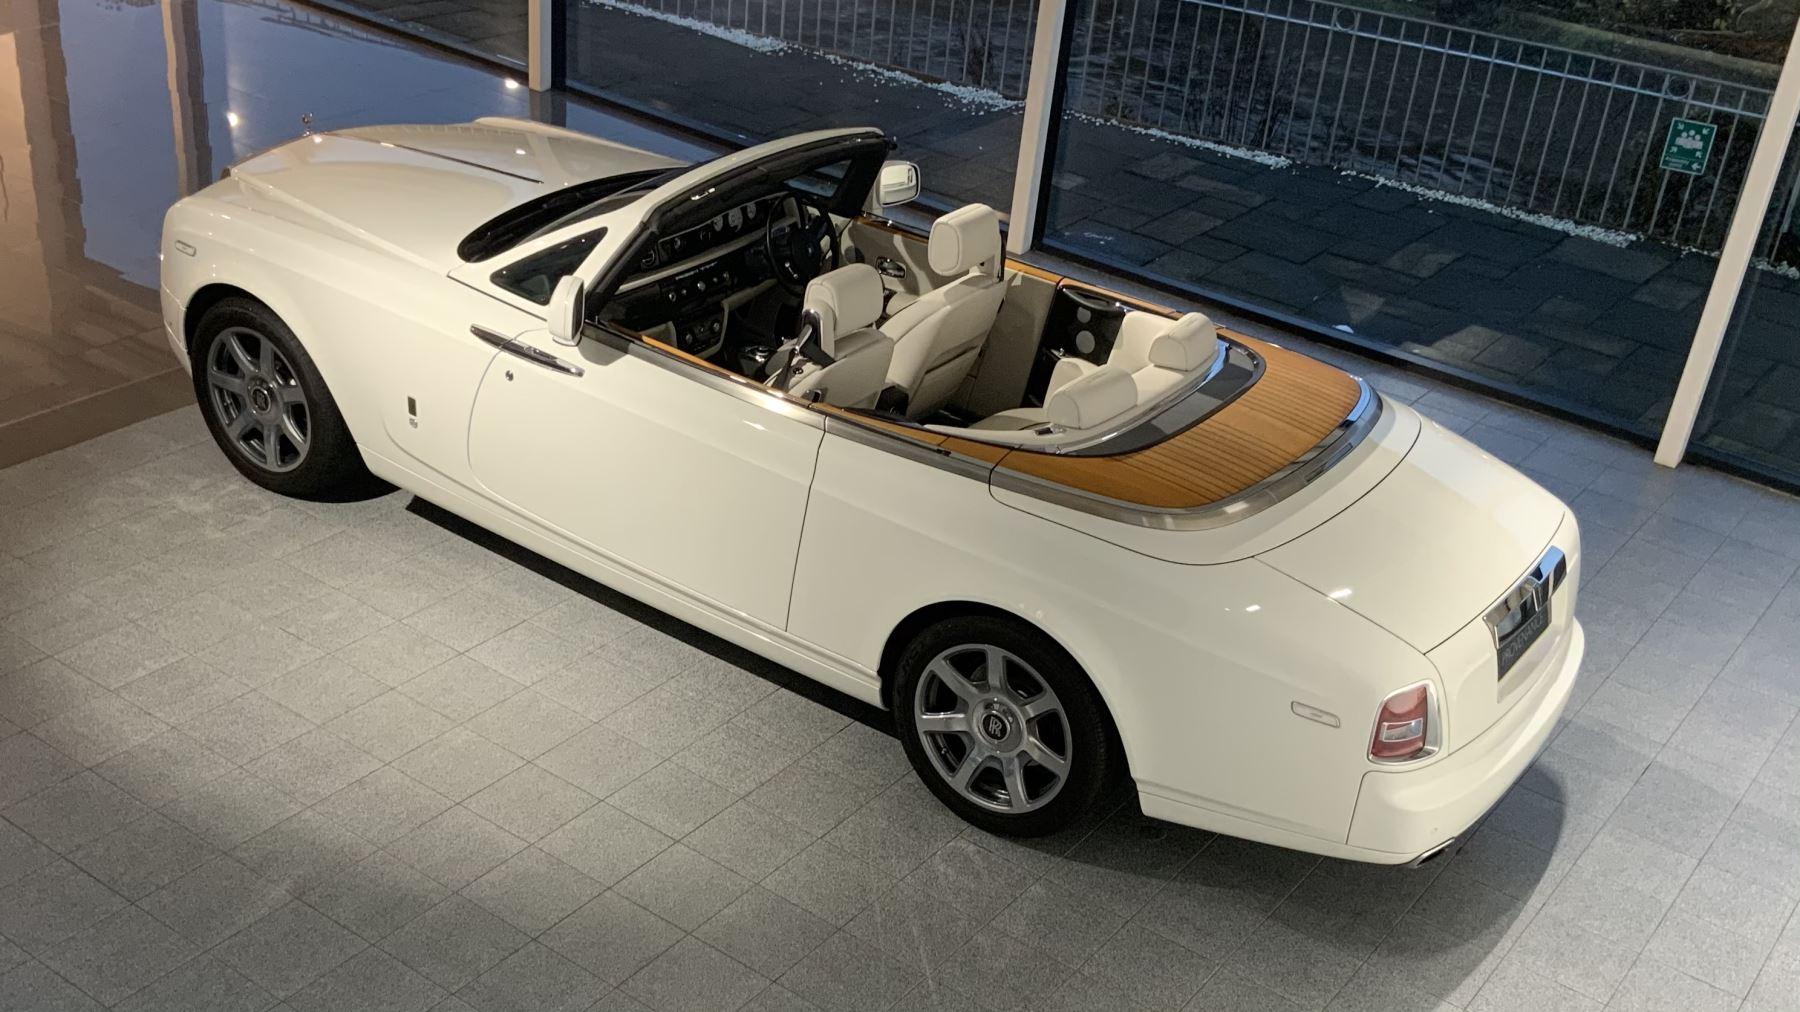 Rolls-Royce Phantom Drophead Coupe Series 2 image 14